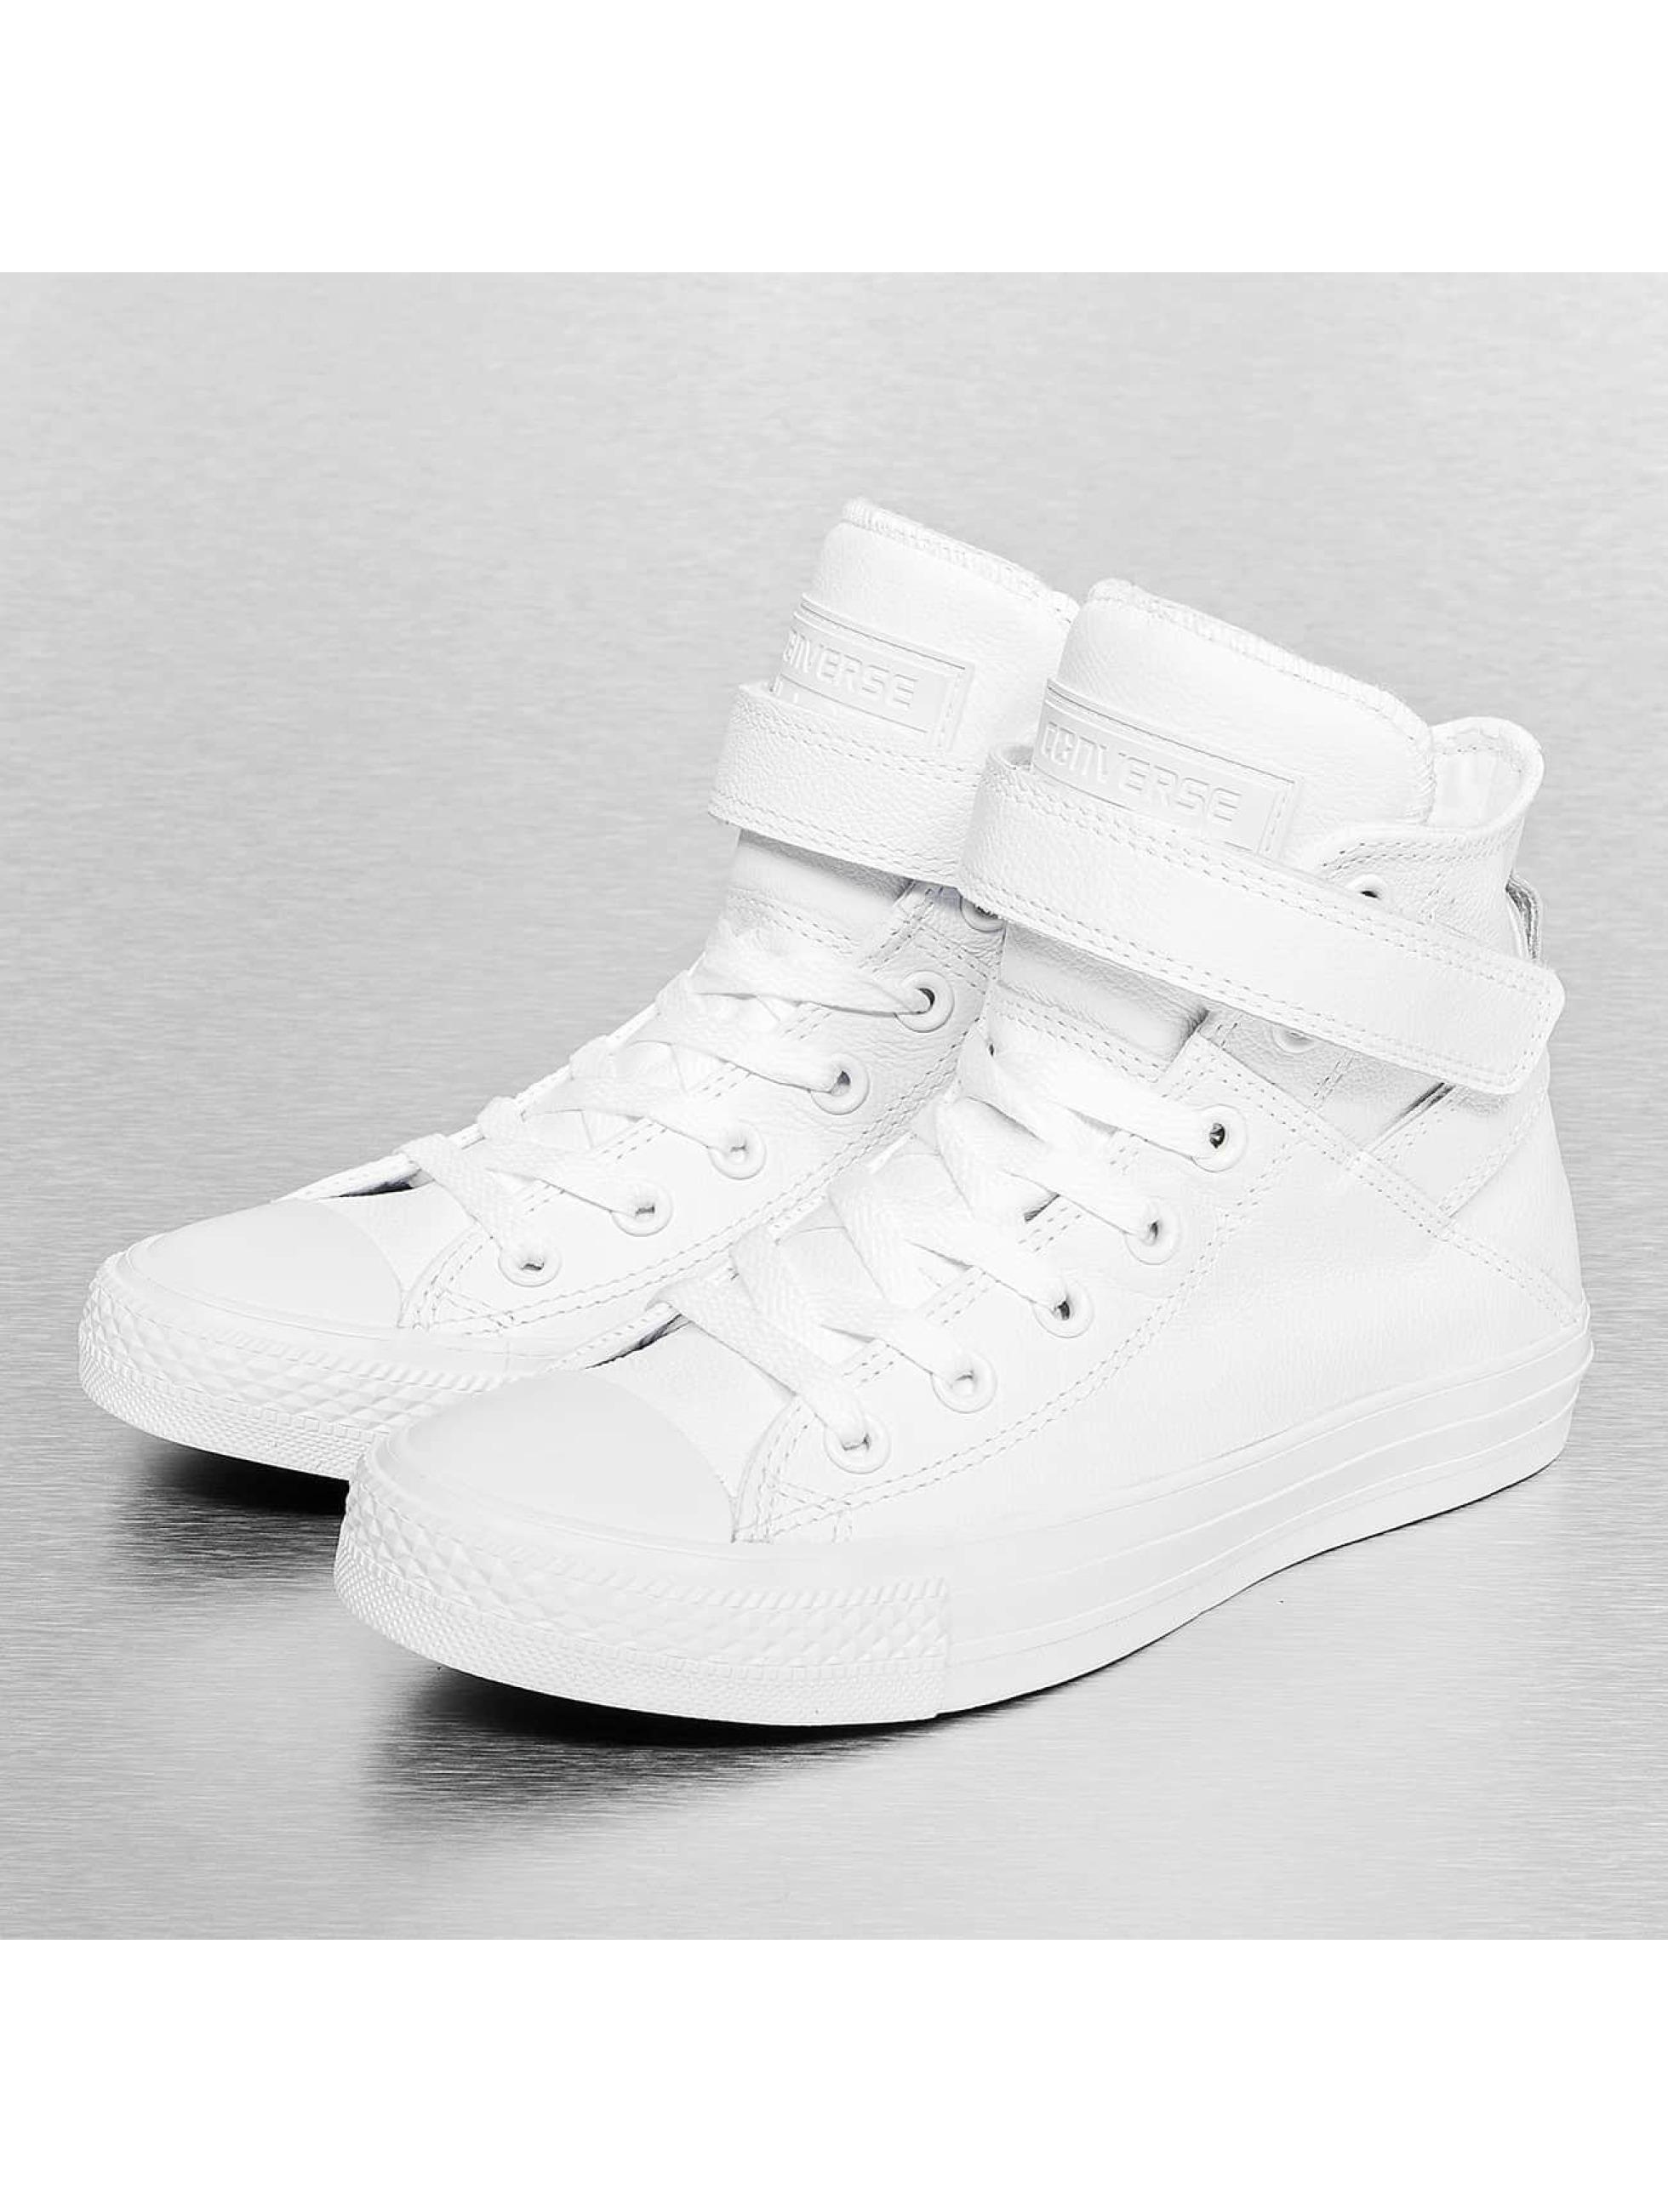 converse schuhe sneaker chuck taylor all star brea mono. Black Bedroom Furniture Sets. Home Design Ideas